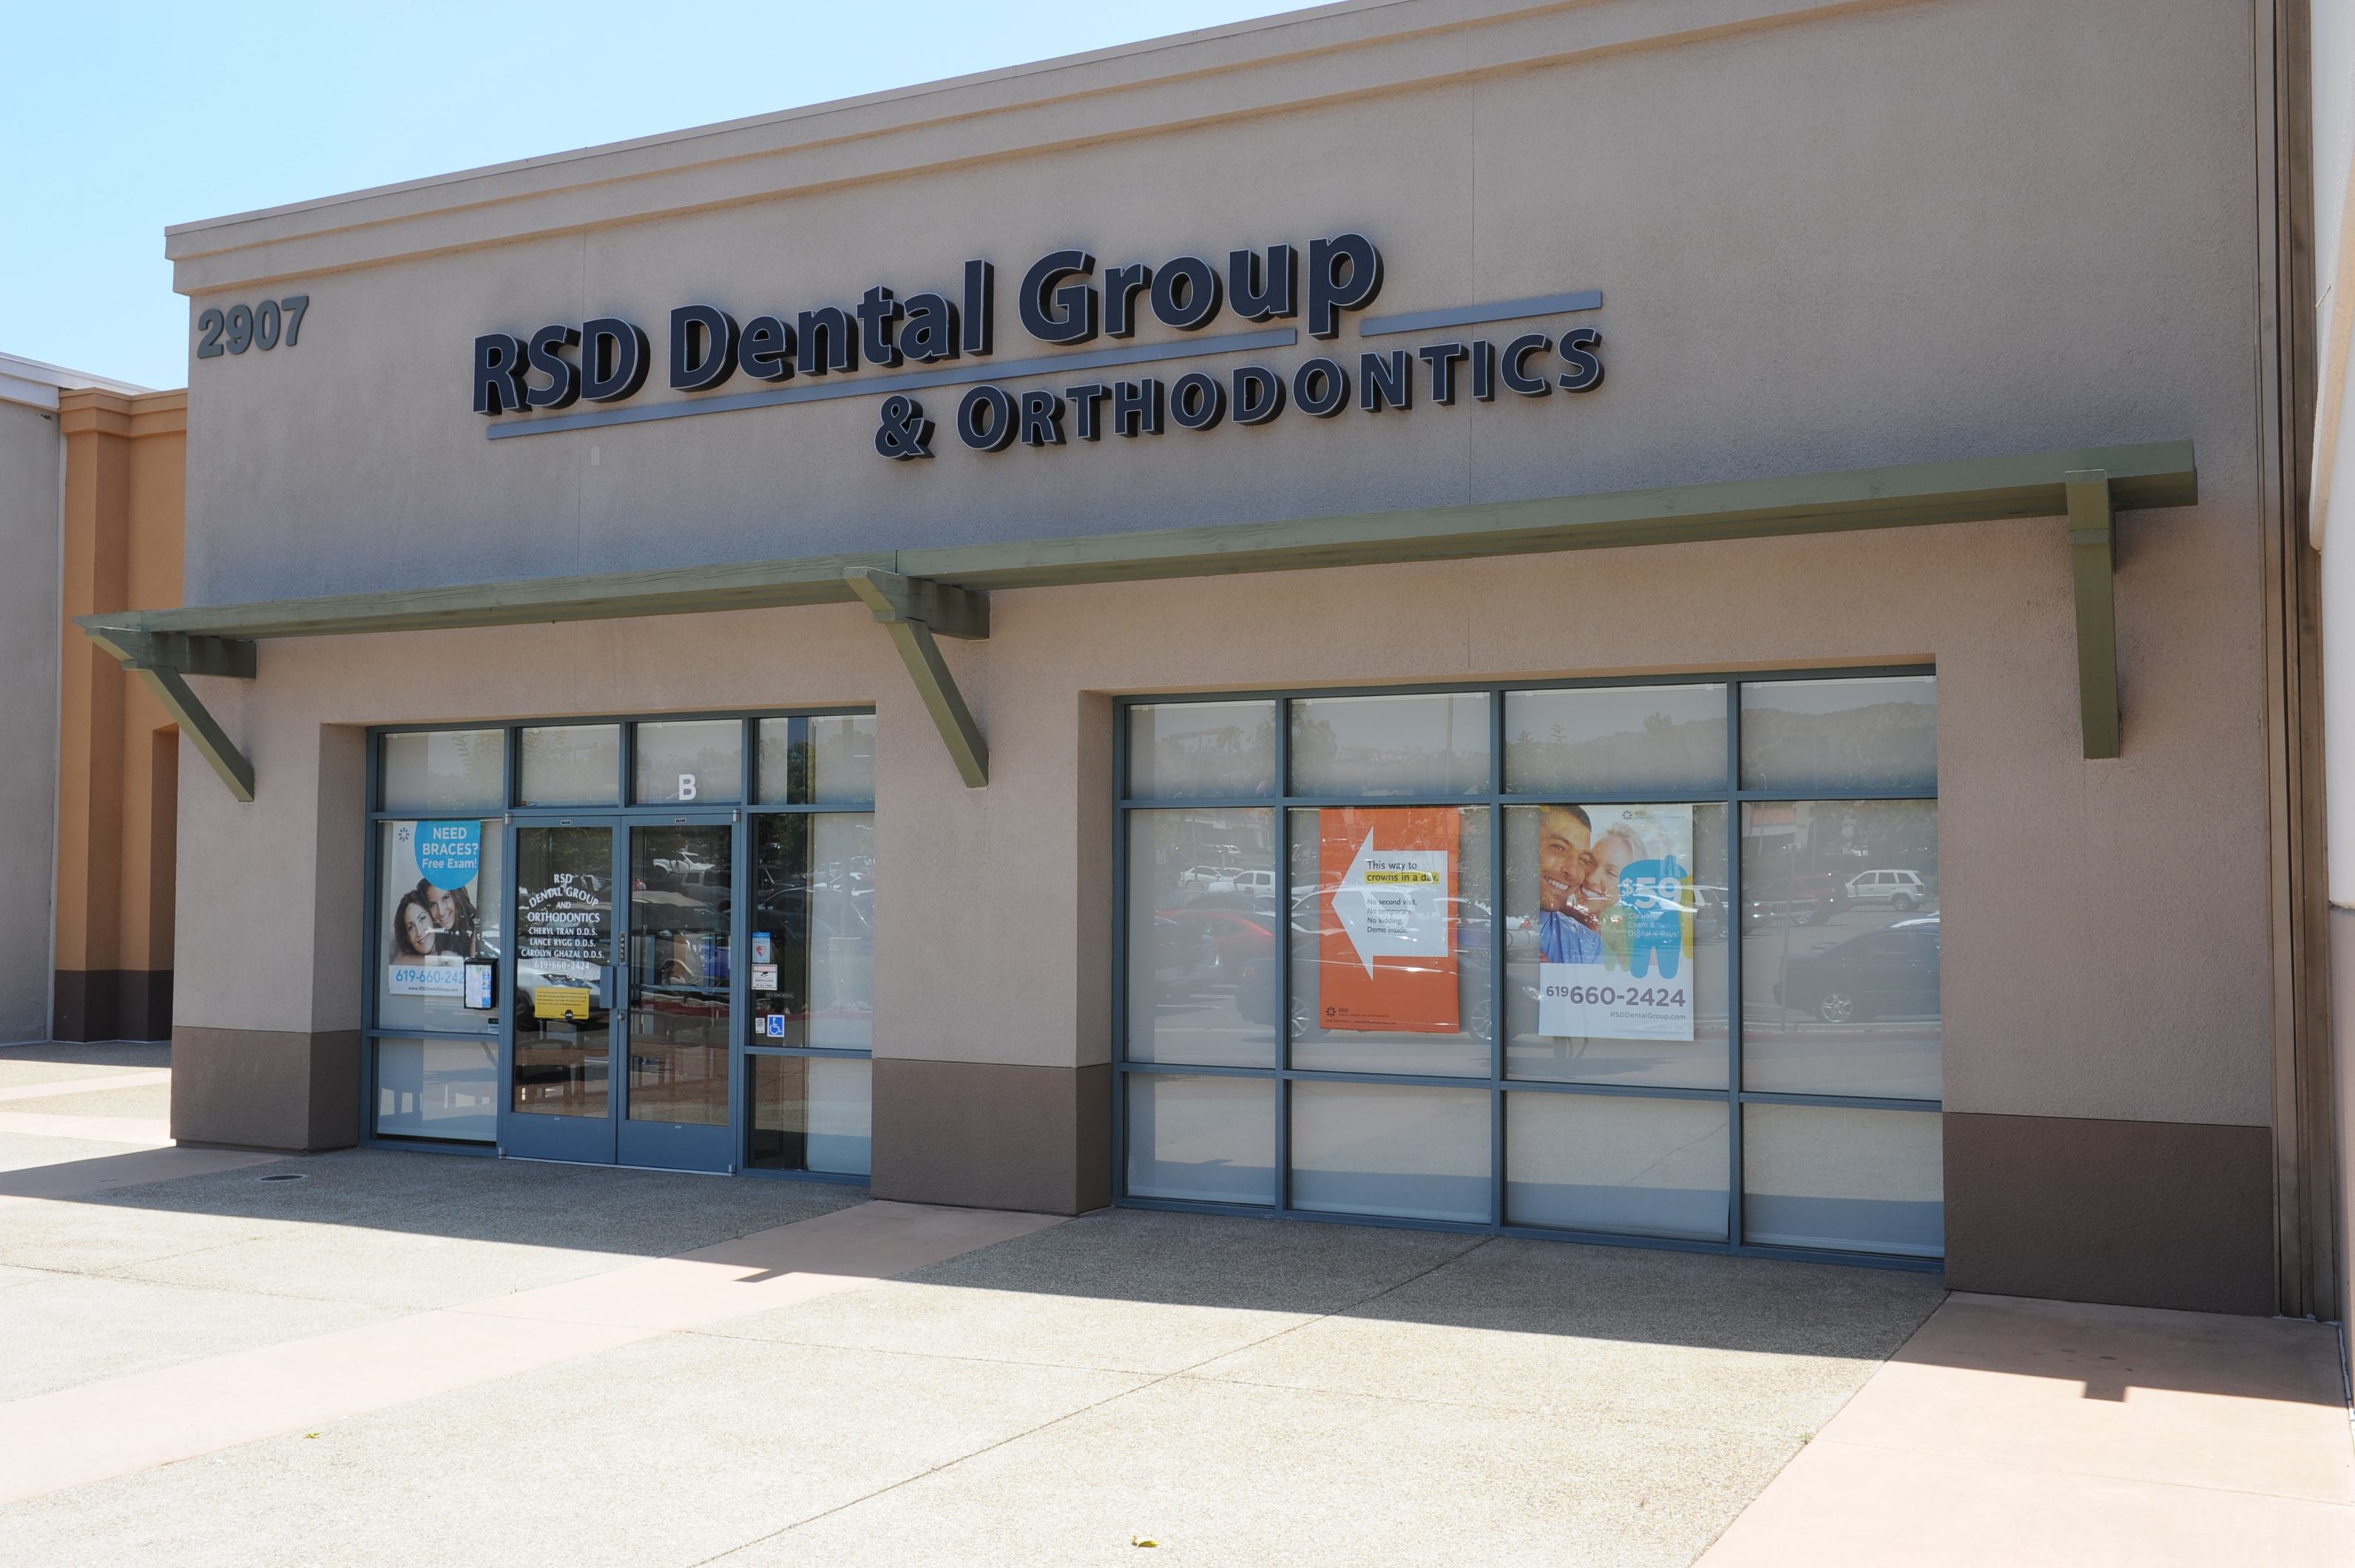 RSD Dental Group and Orthodontics image 1